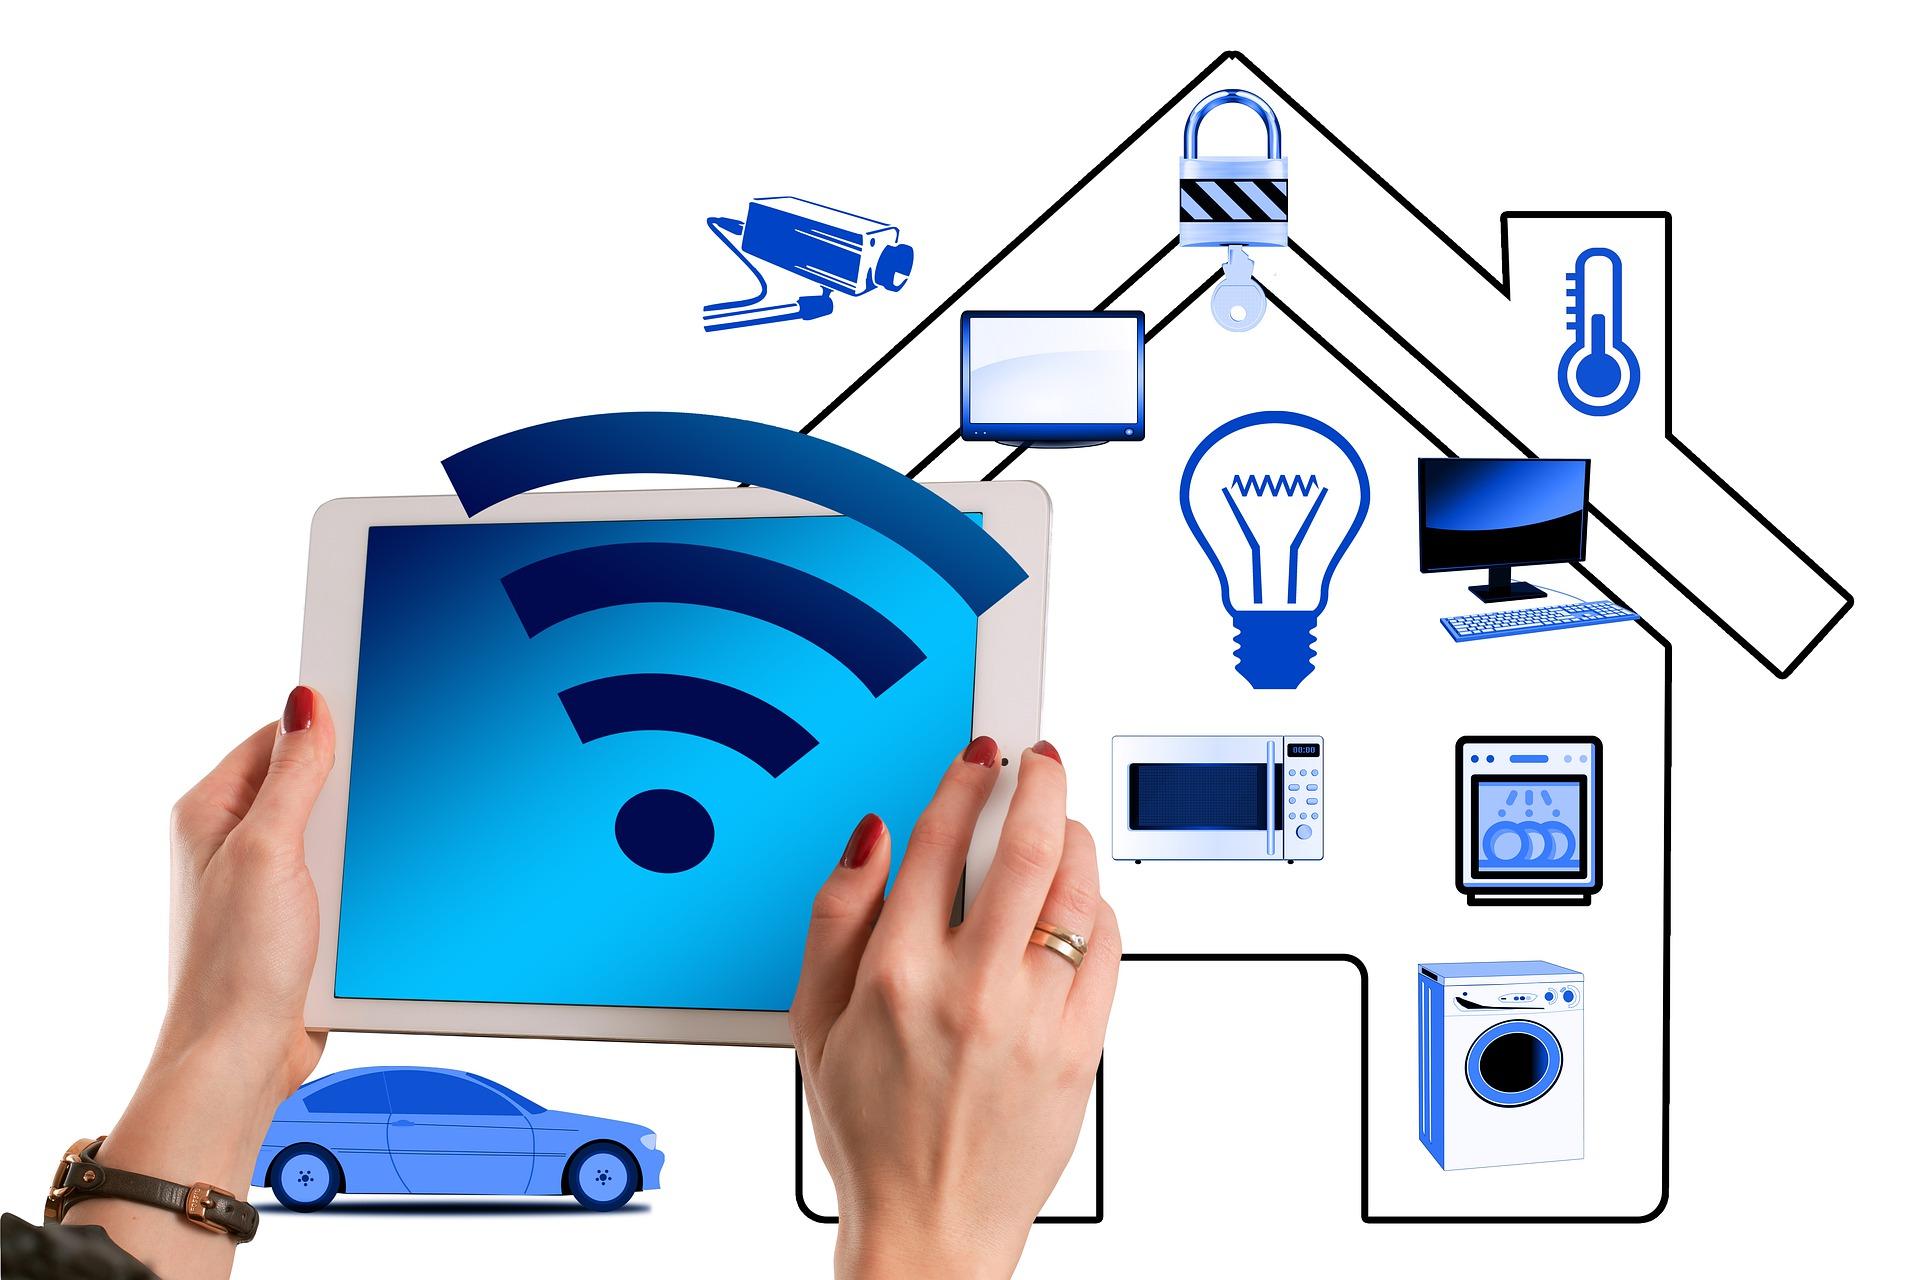 smart-home-3096219_1920-1